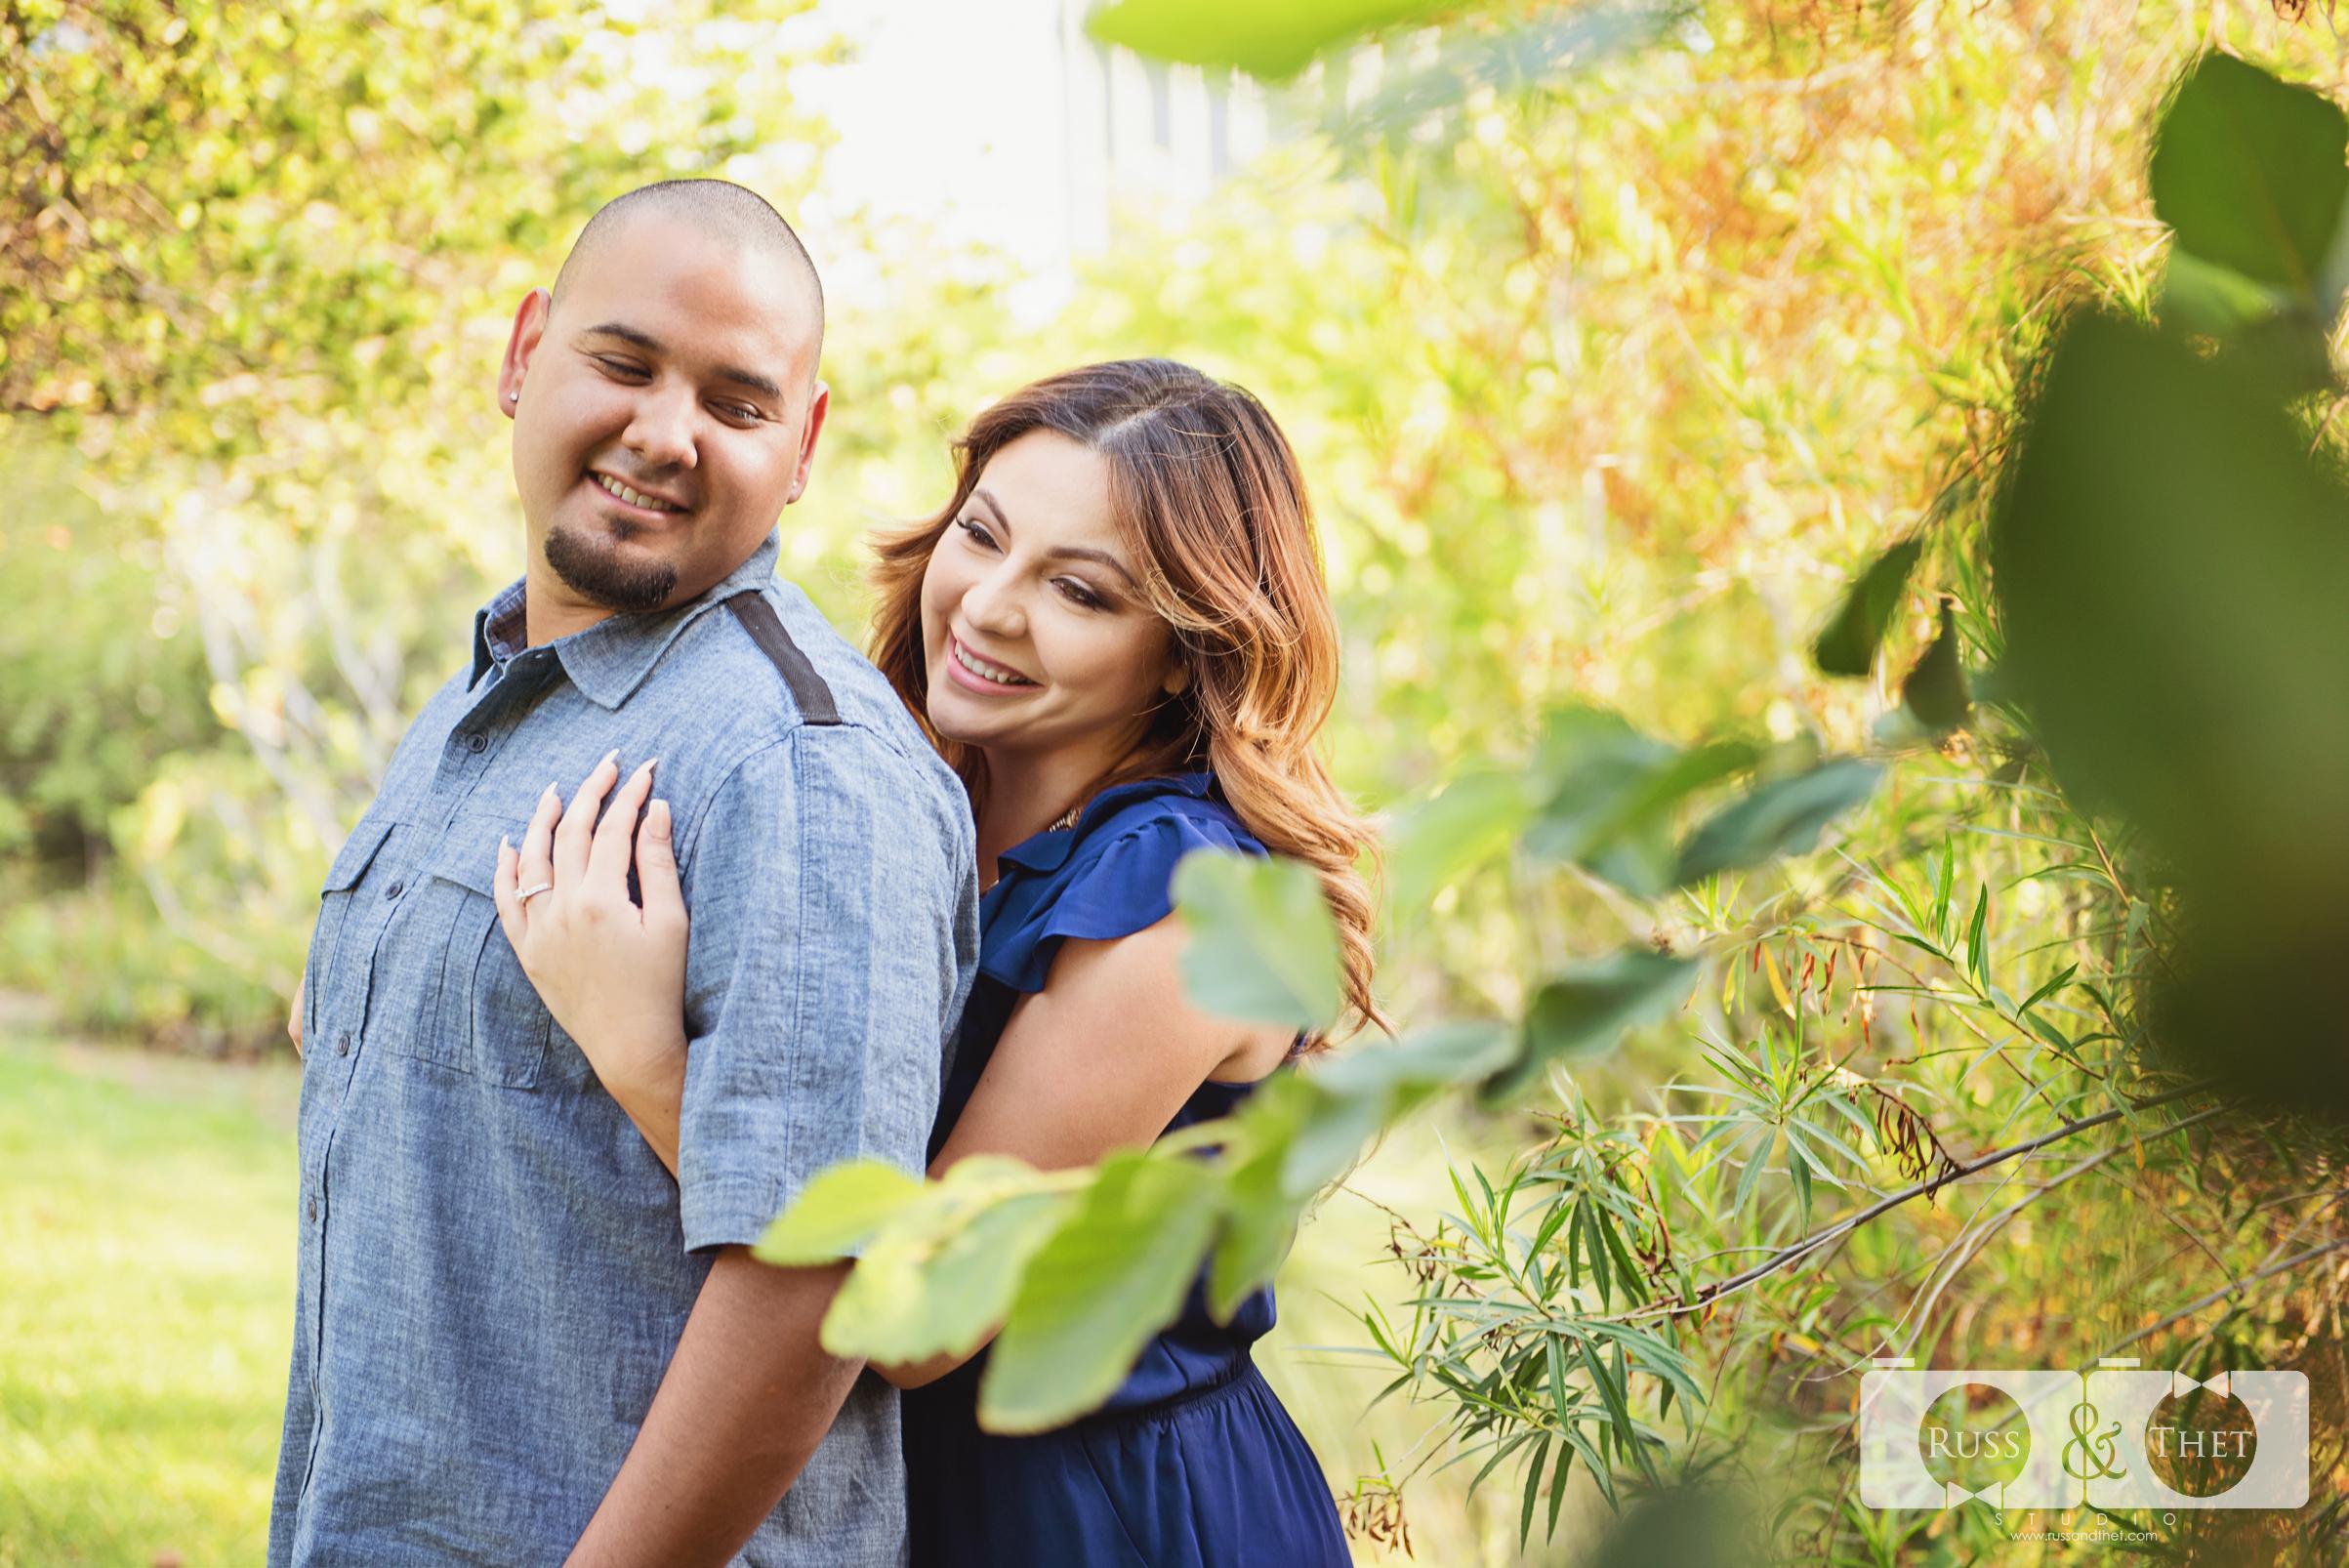 Vista-Hermosa-Park-Engagement-Photographer (6).jpg